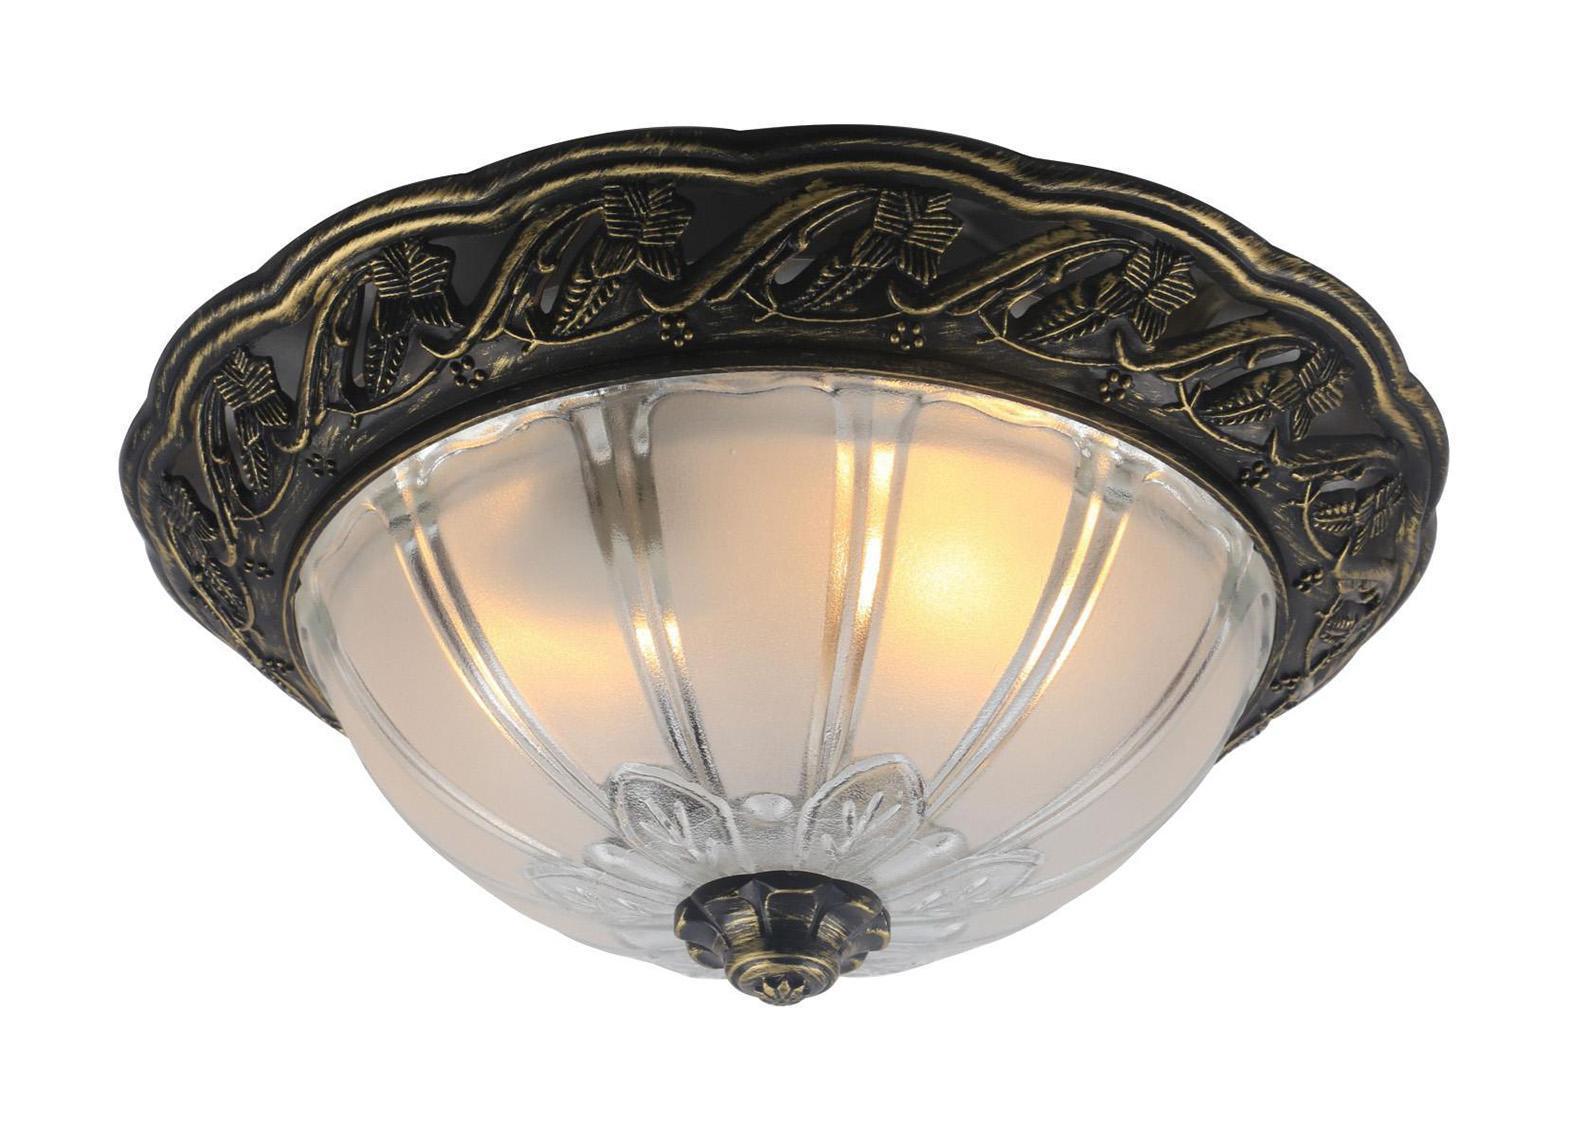 A8003PL-2AB PIATTI Потолочный светильник arte lamp piatti a8003pl 2ab